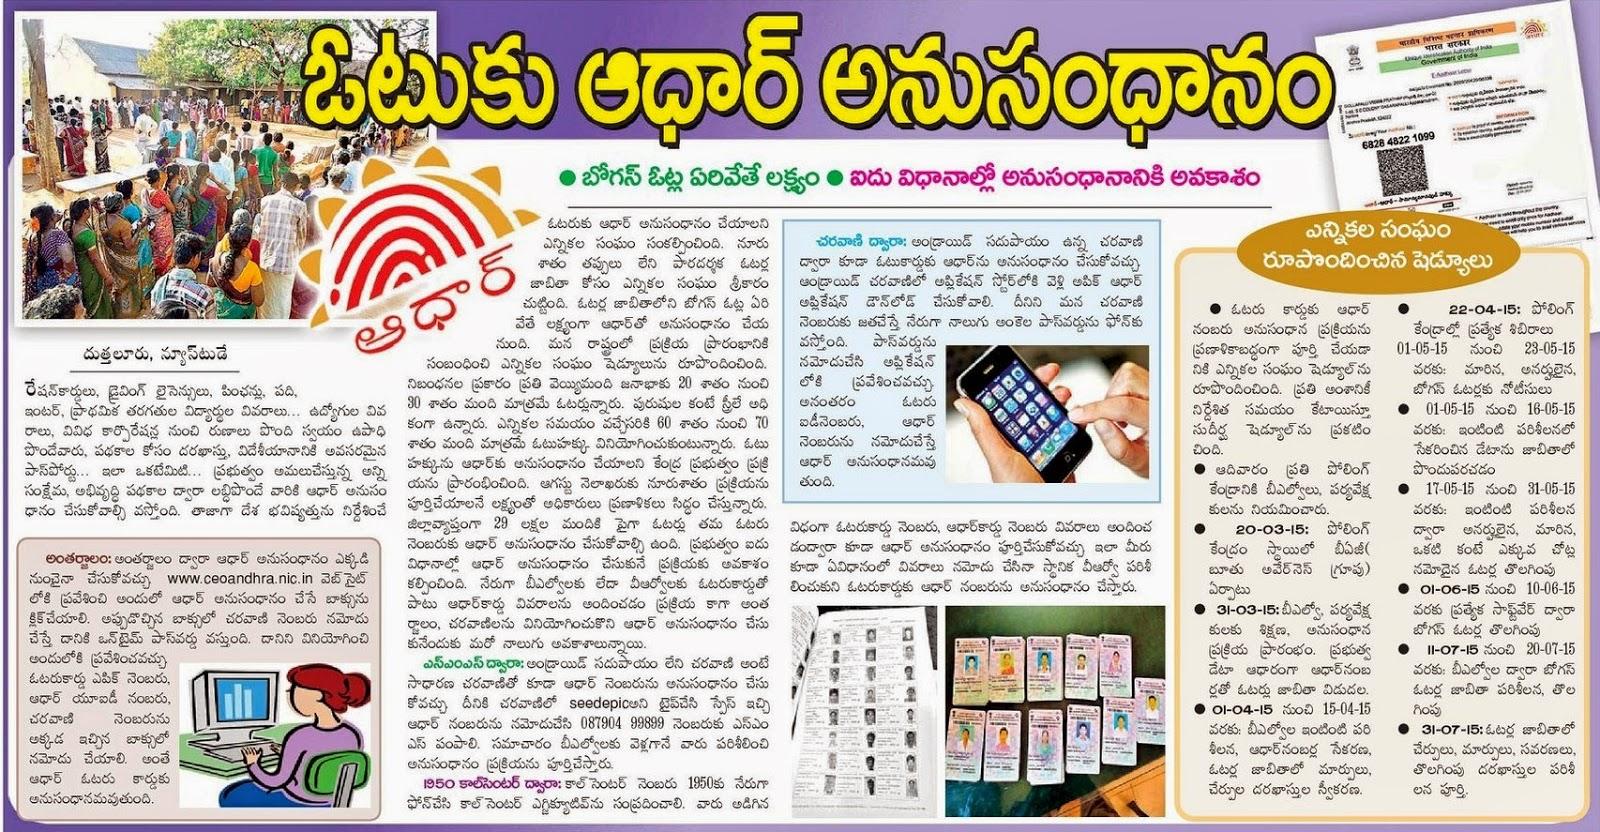 Link Voter ID with Aadhaar Card